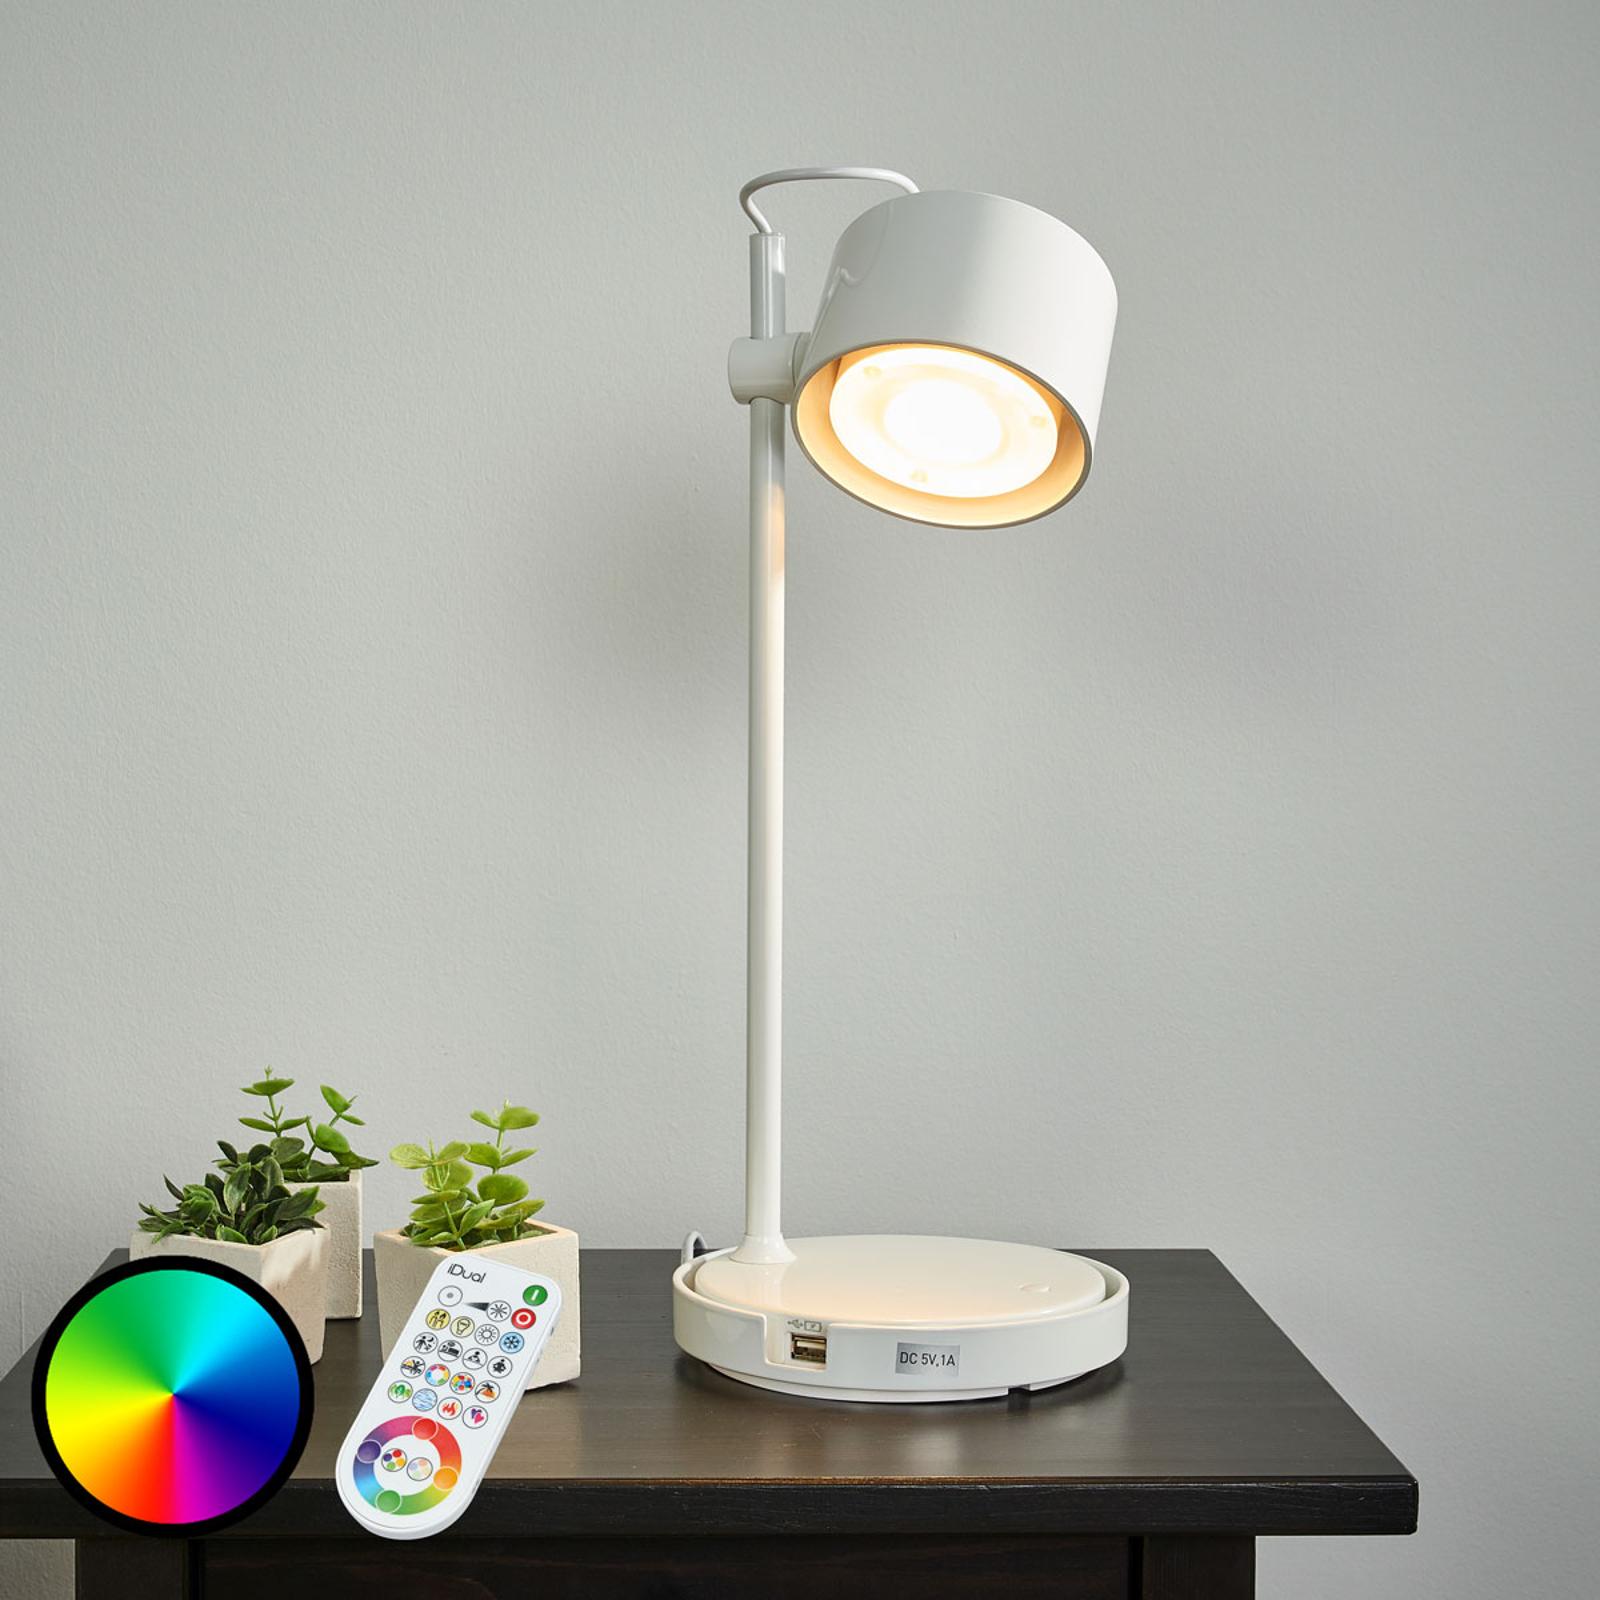 Lampe à poser iDual LED Jasmine blanche brillante